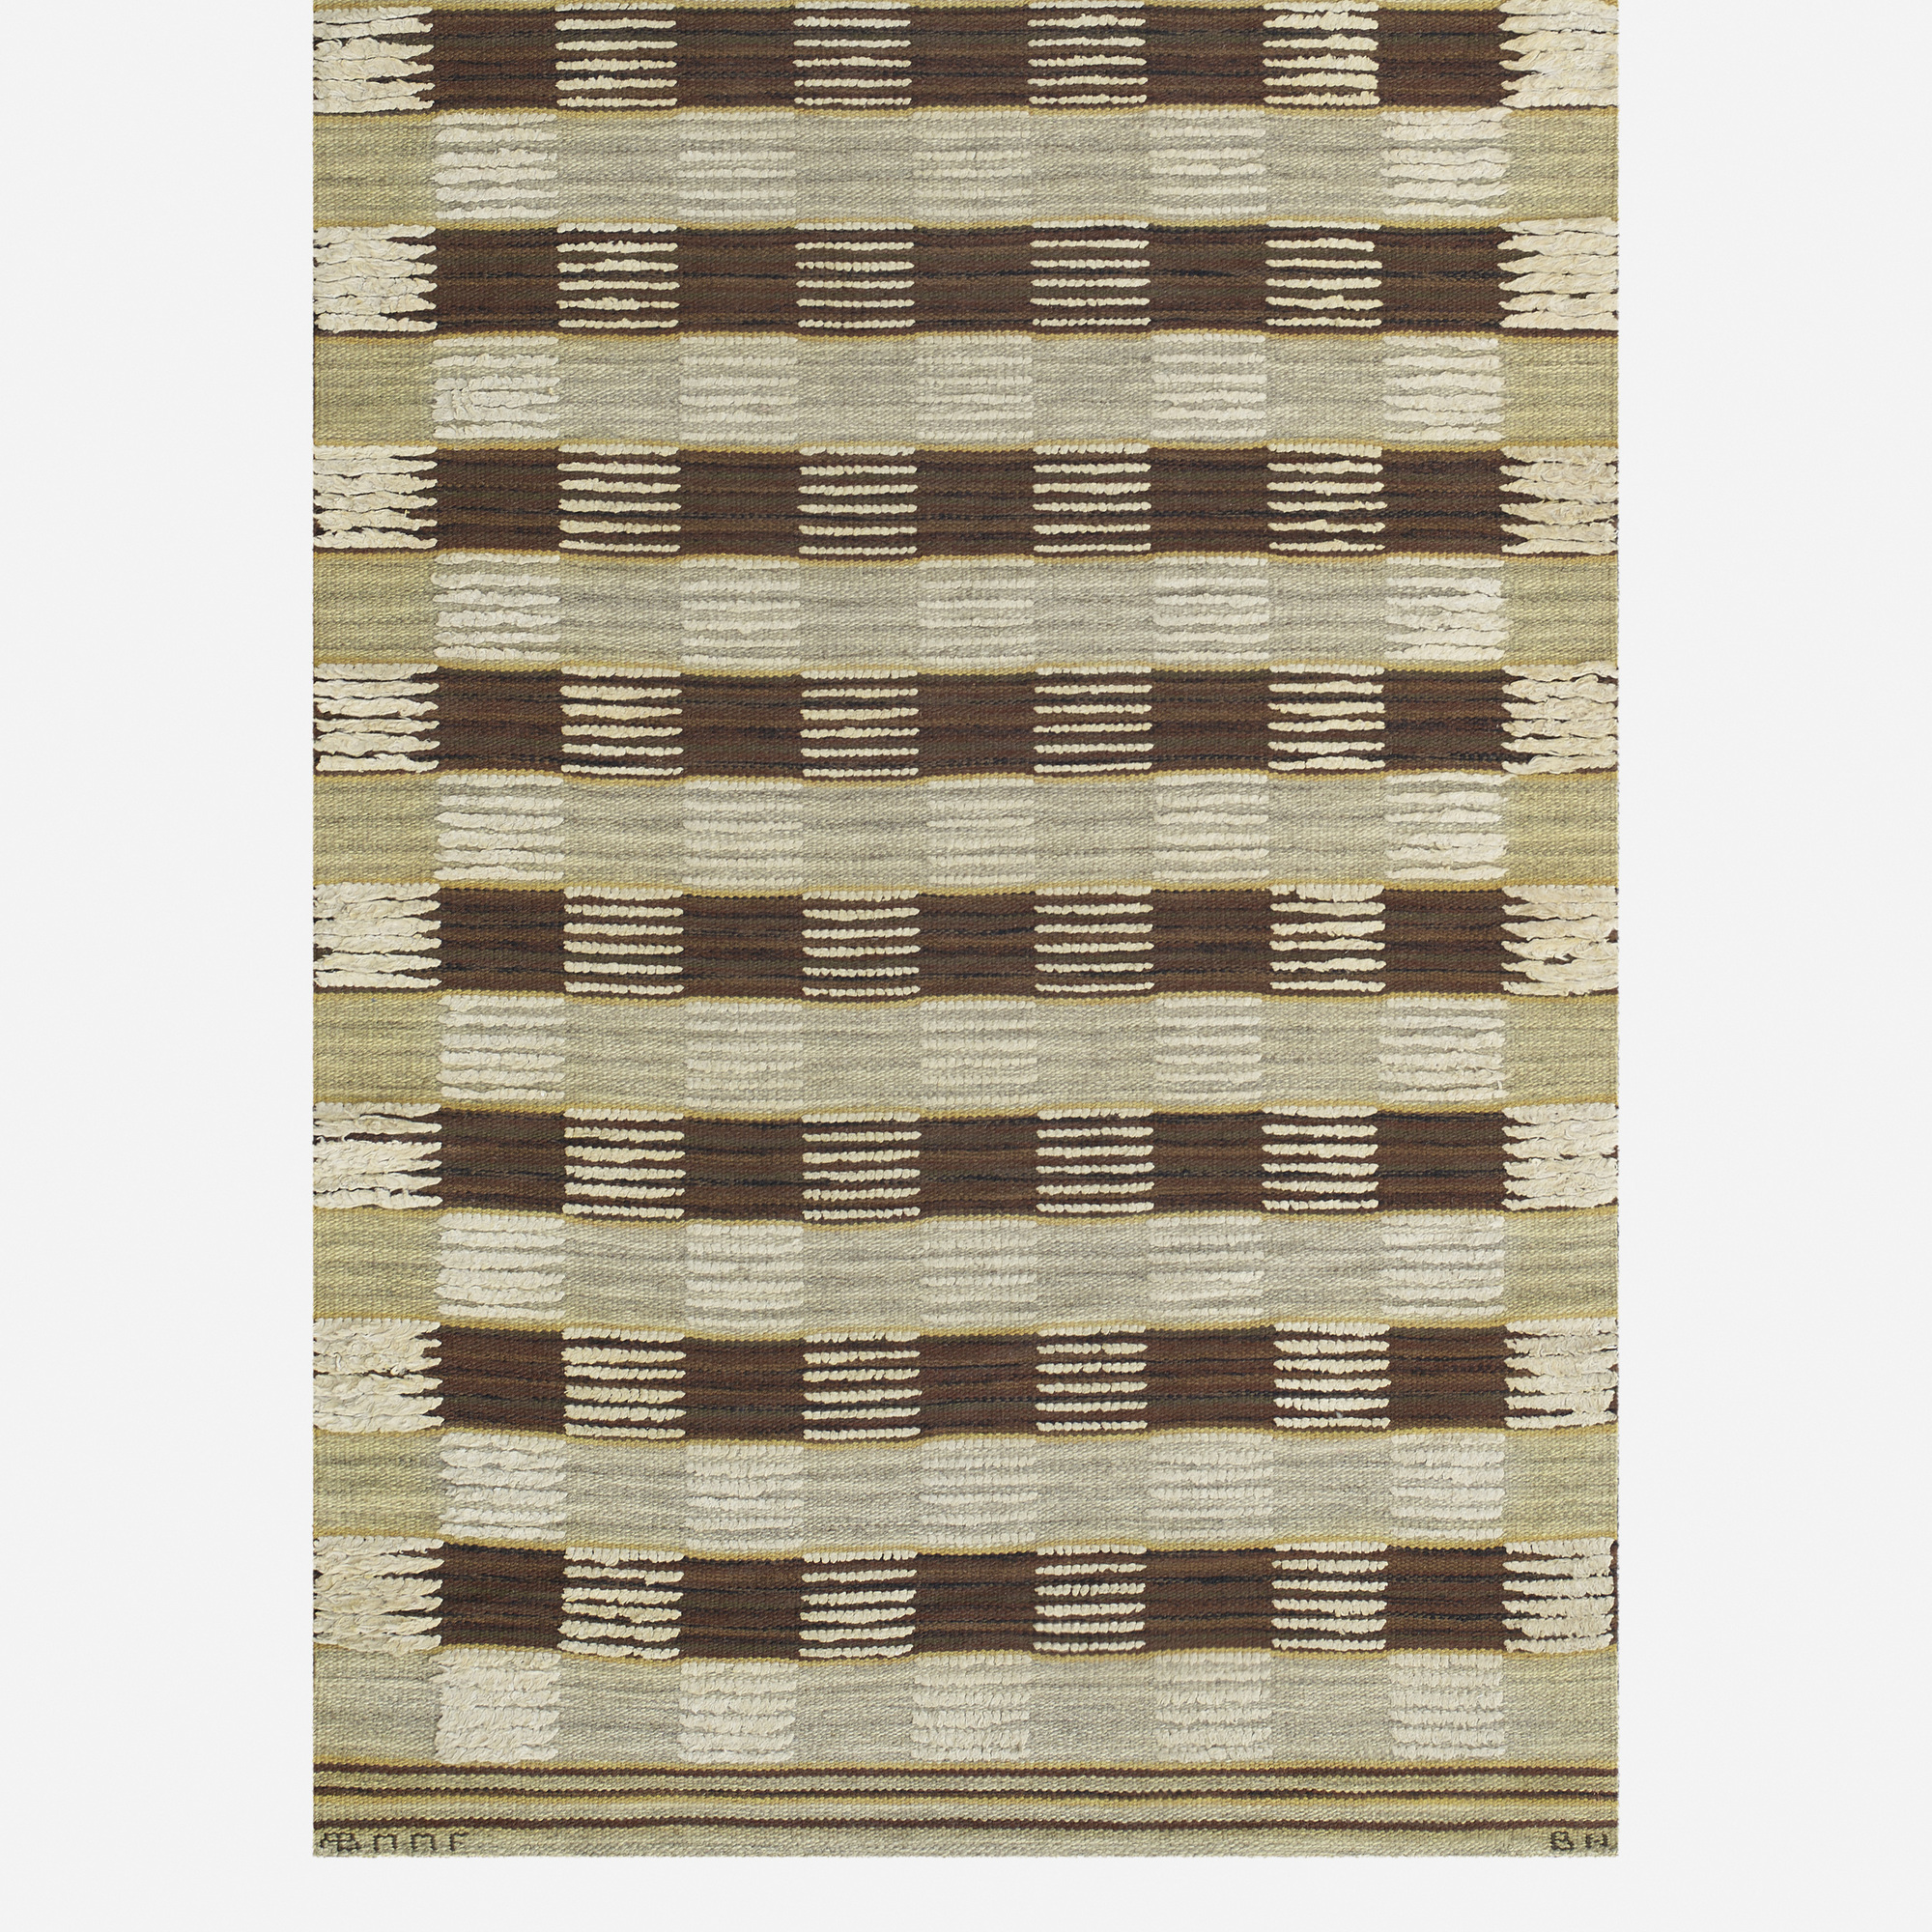 197: Barbro Nilsson / Schackrutig half-pile carpet (2 of 2)